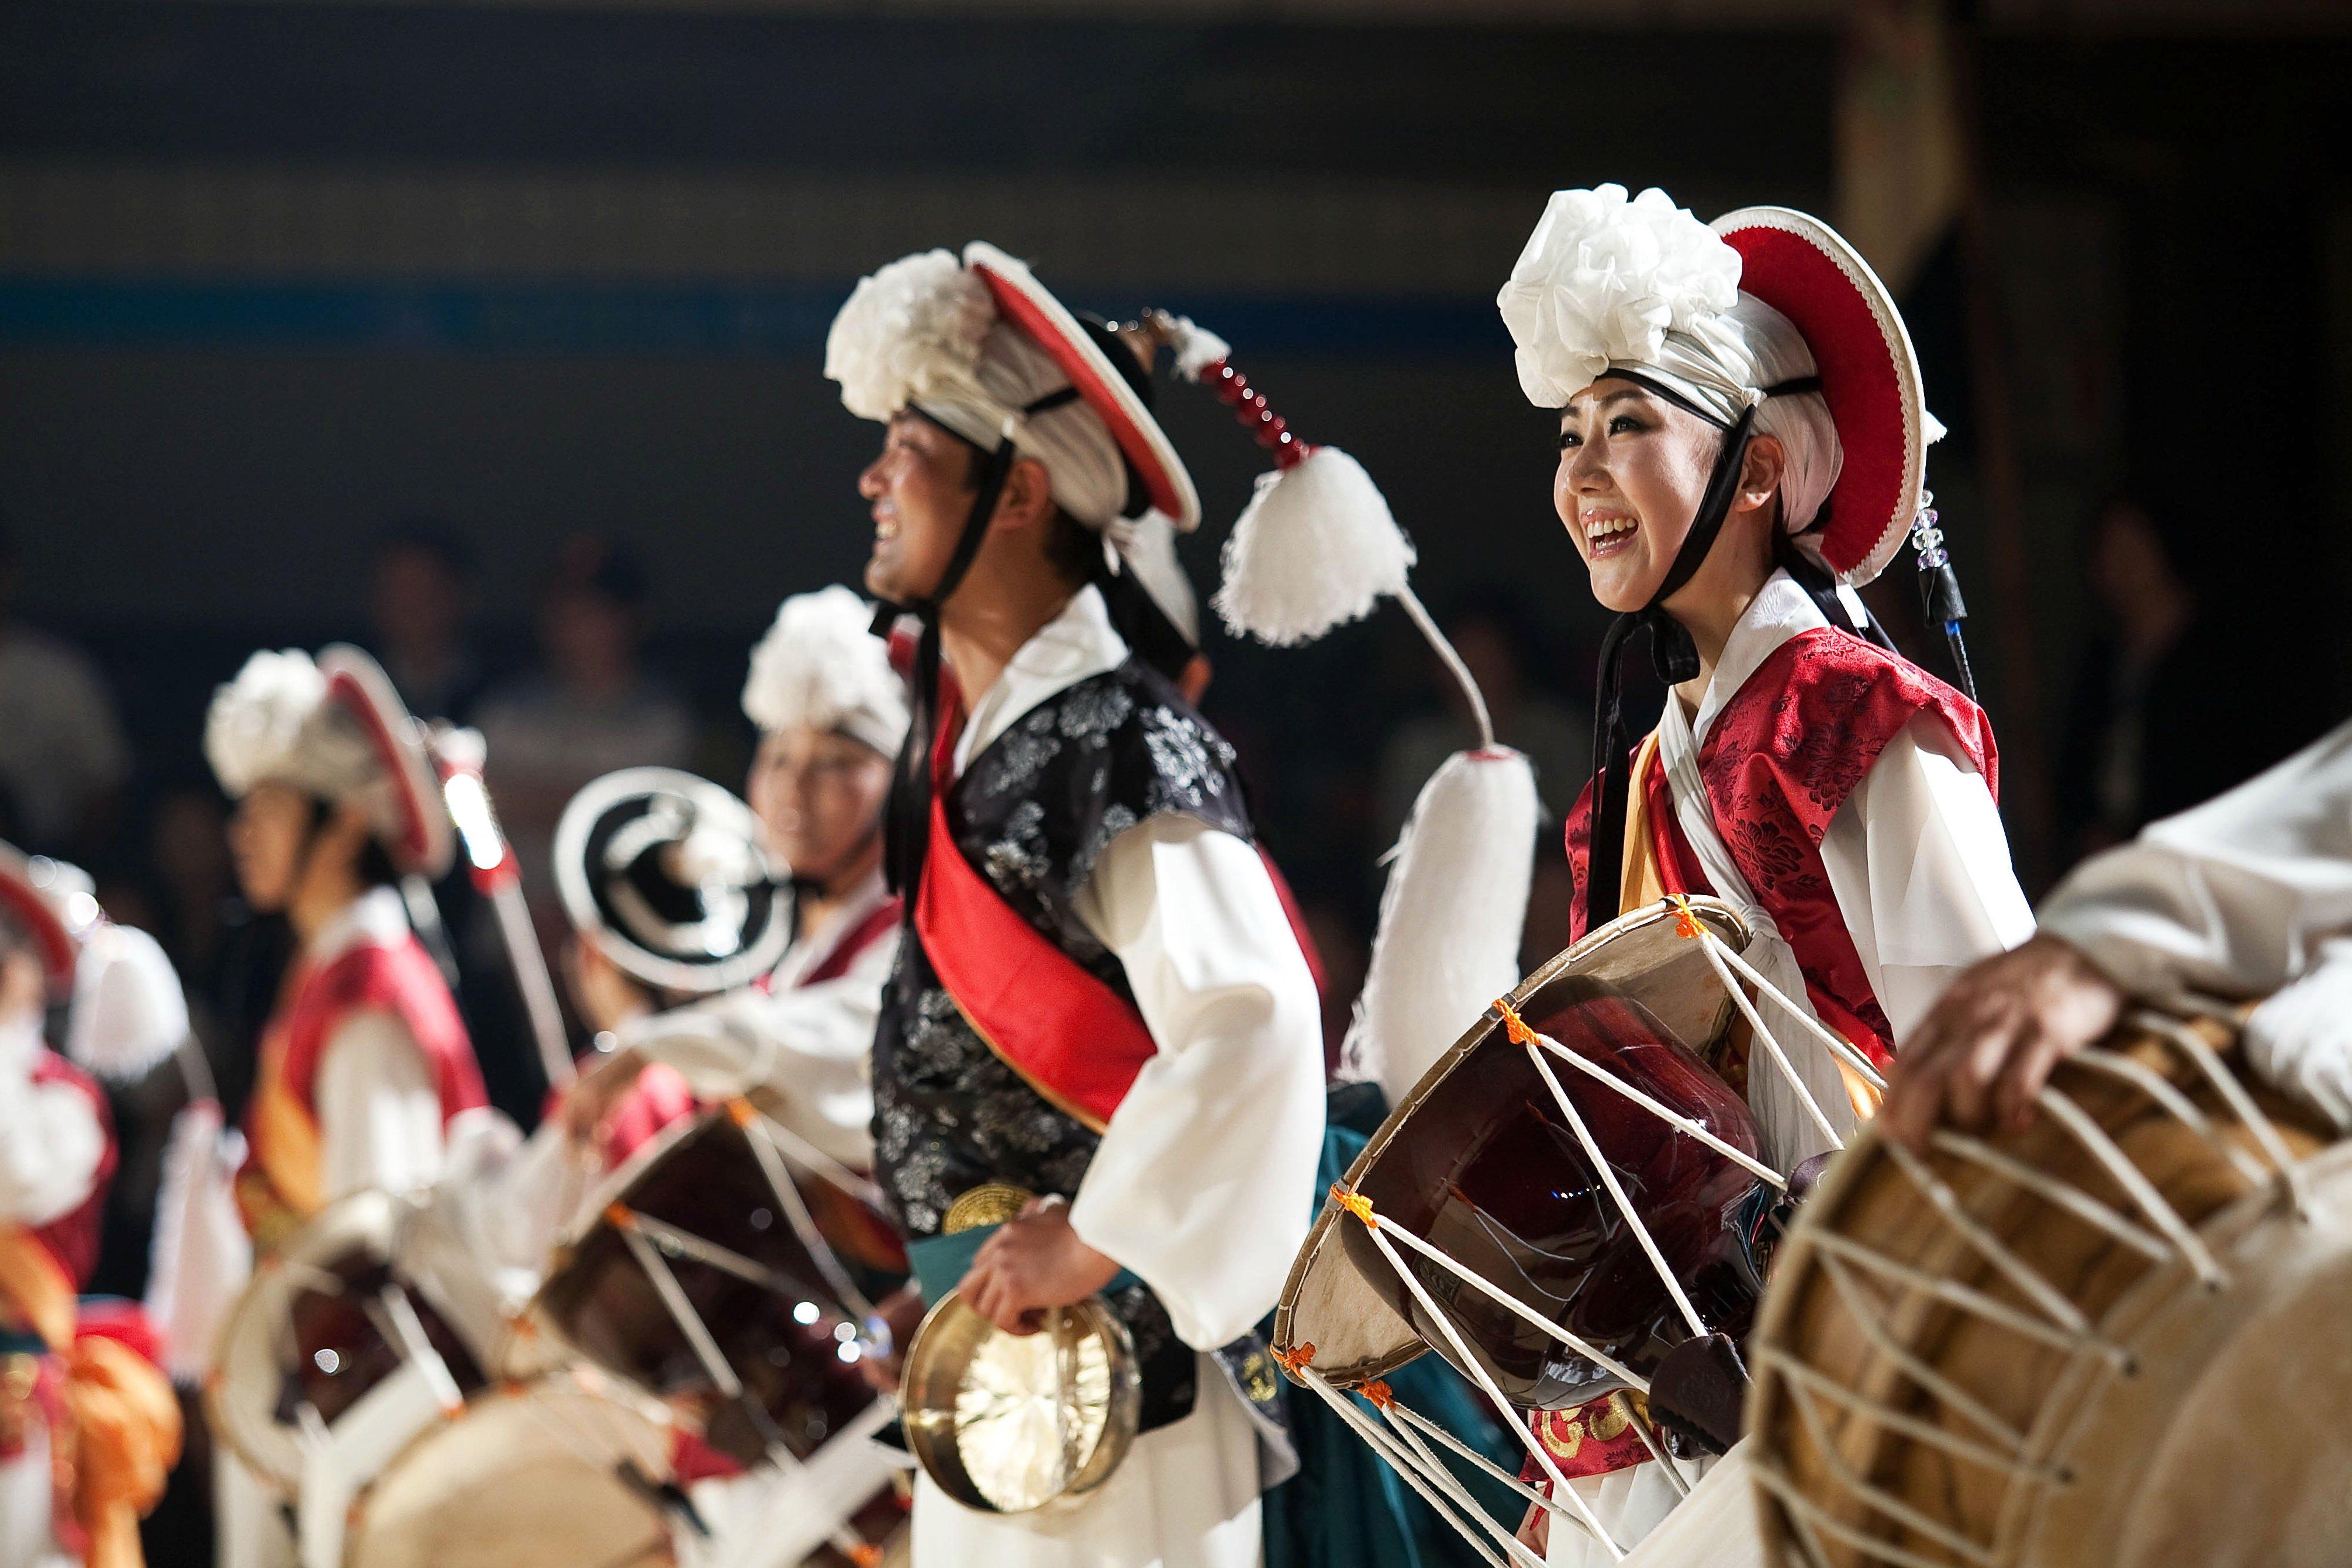 Фестиваль «Мост вКорею»